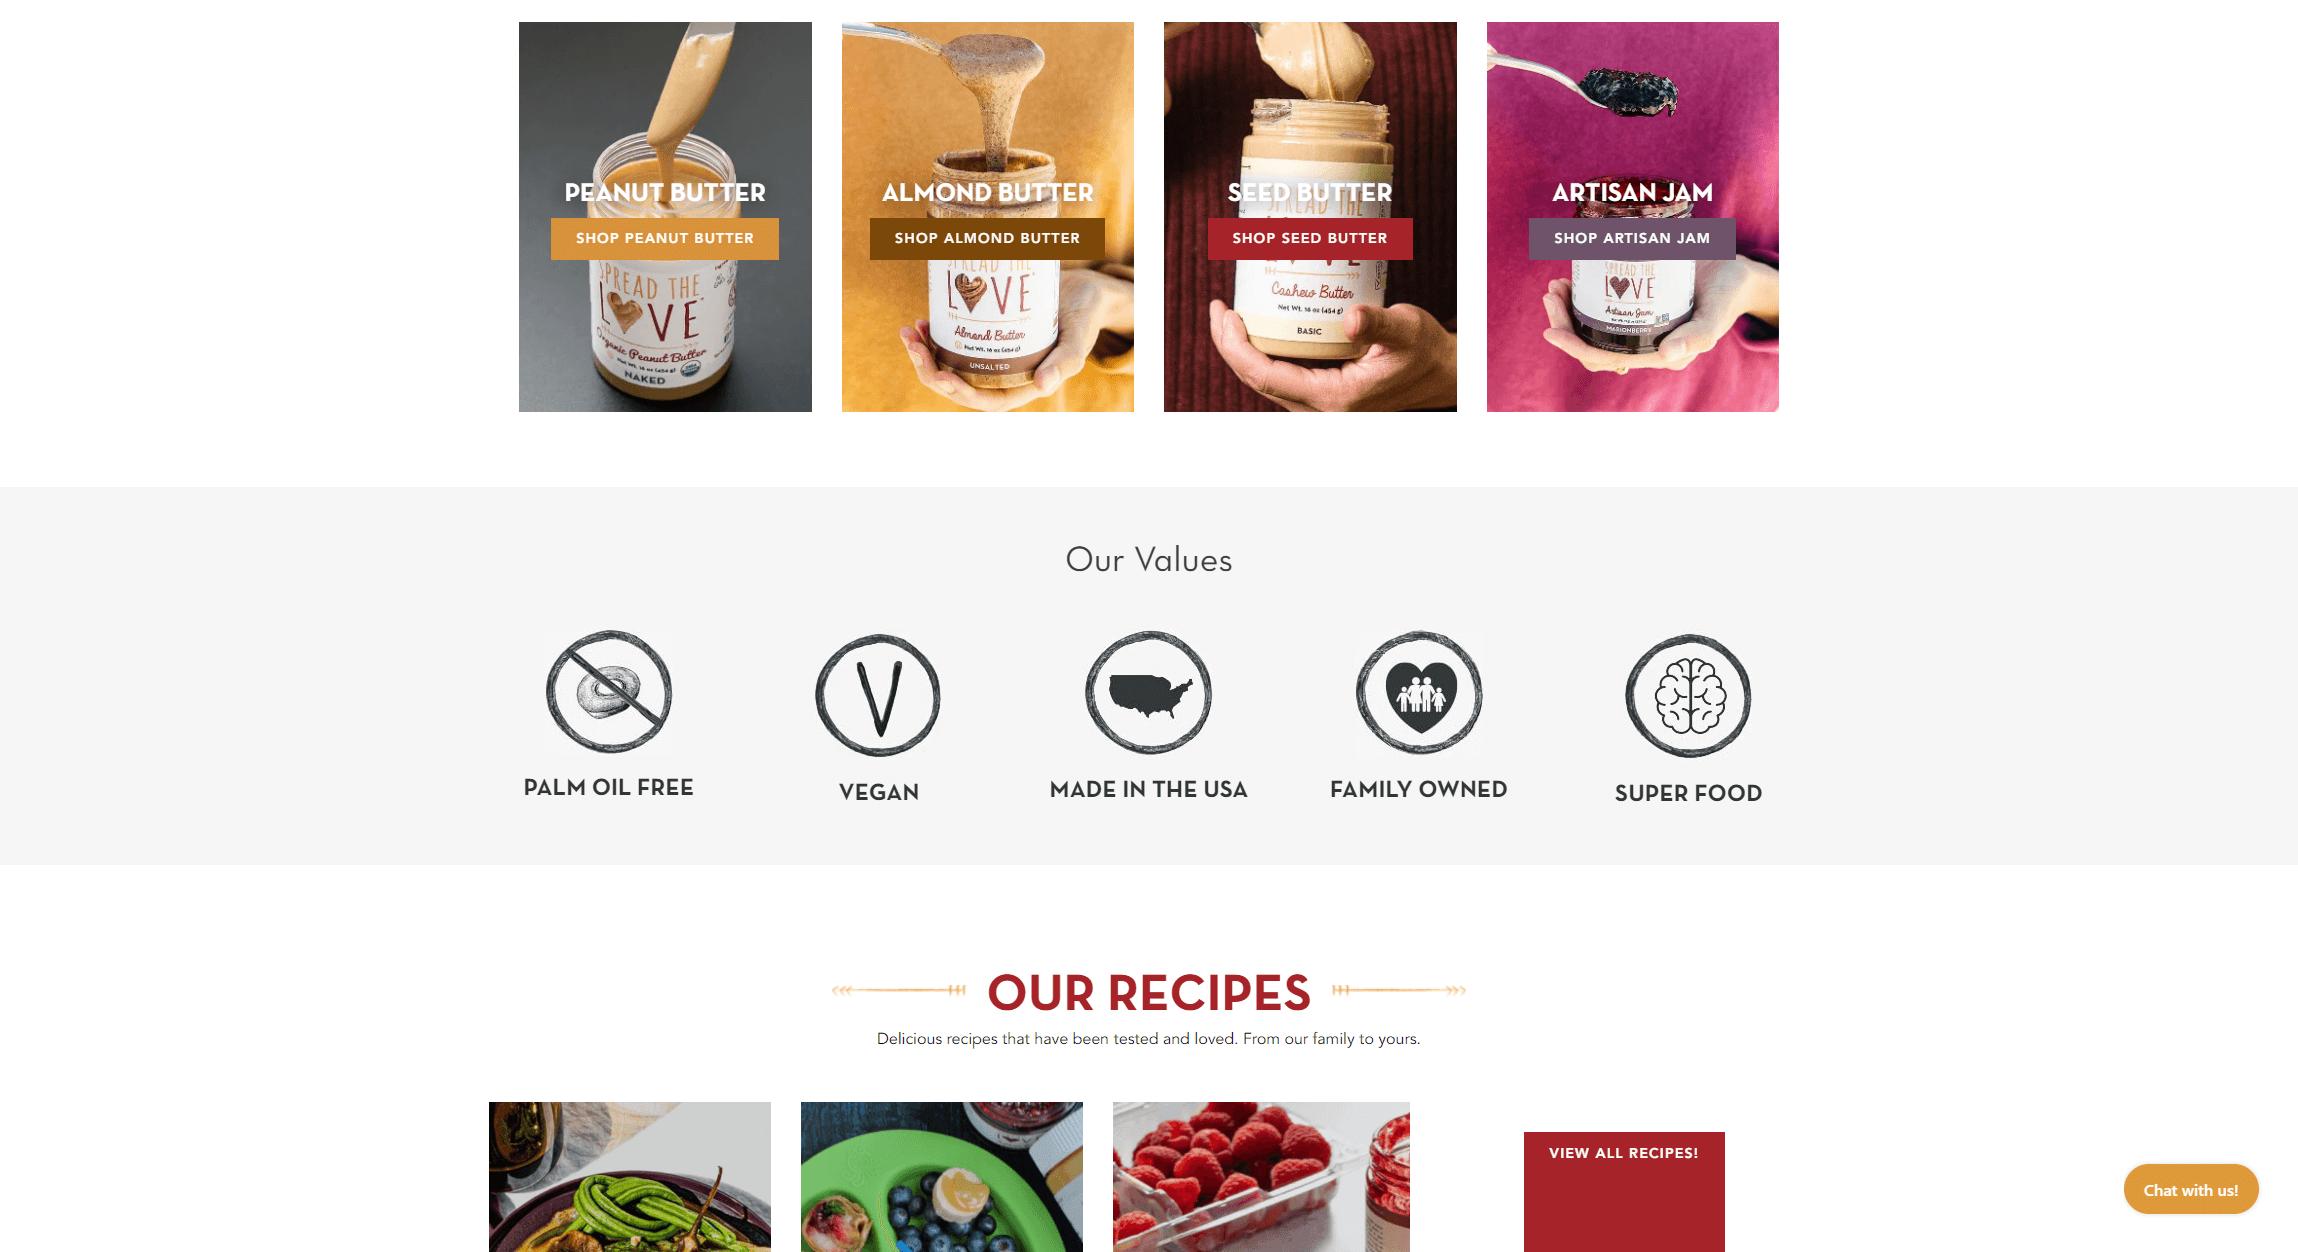 spreadthelovefoods.com-2